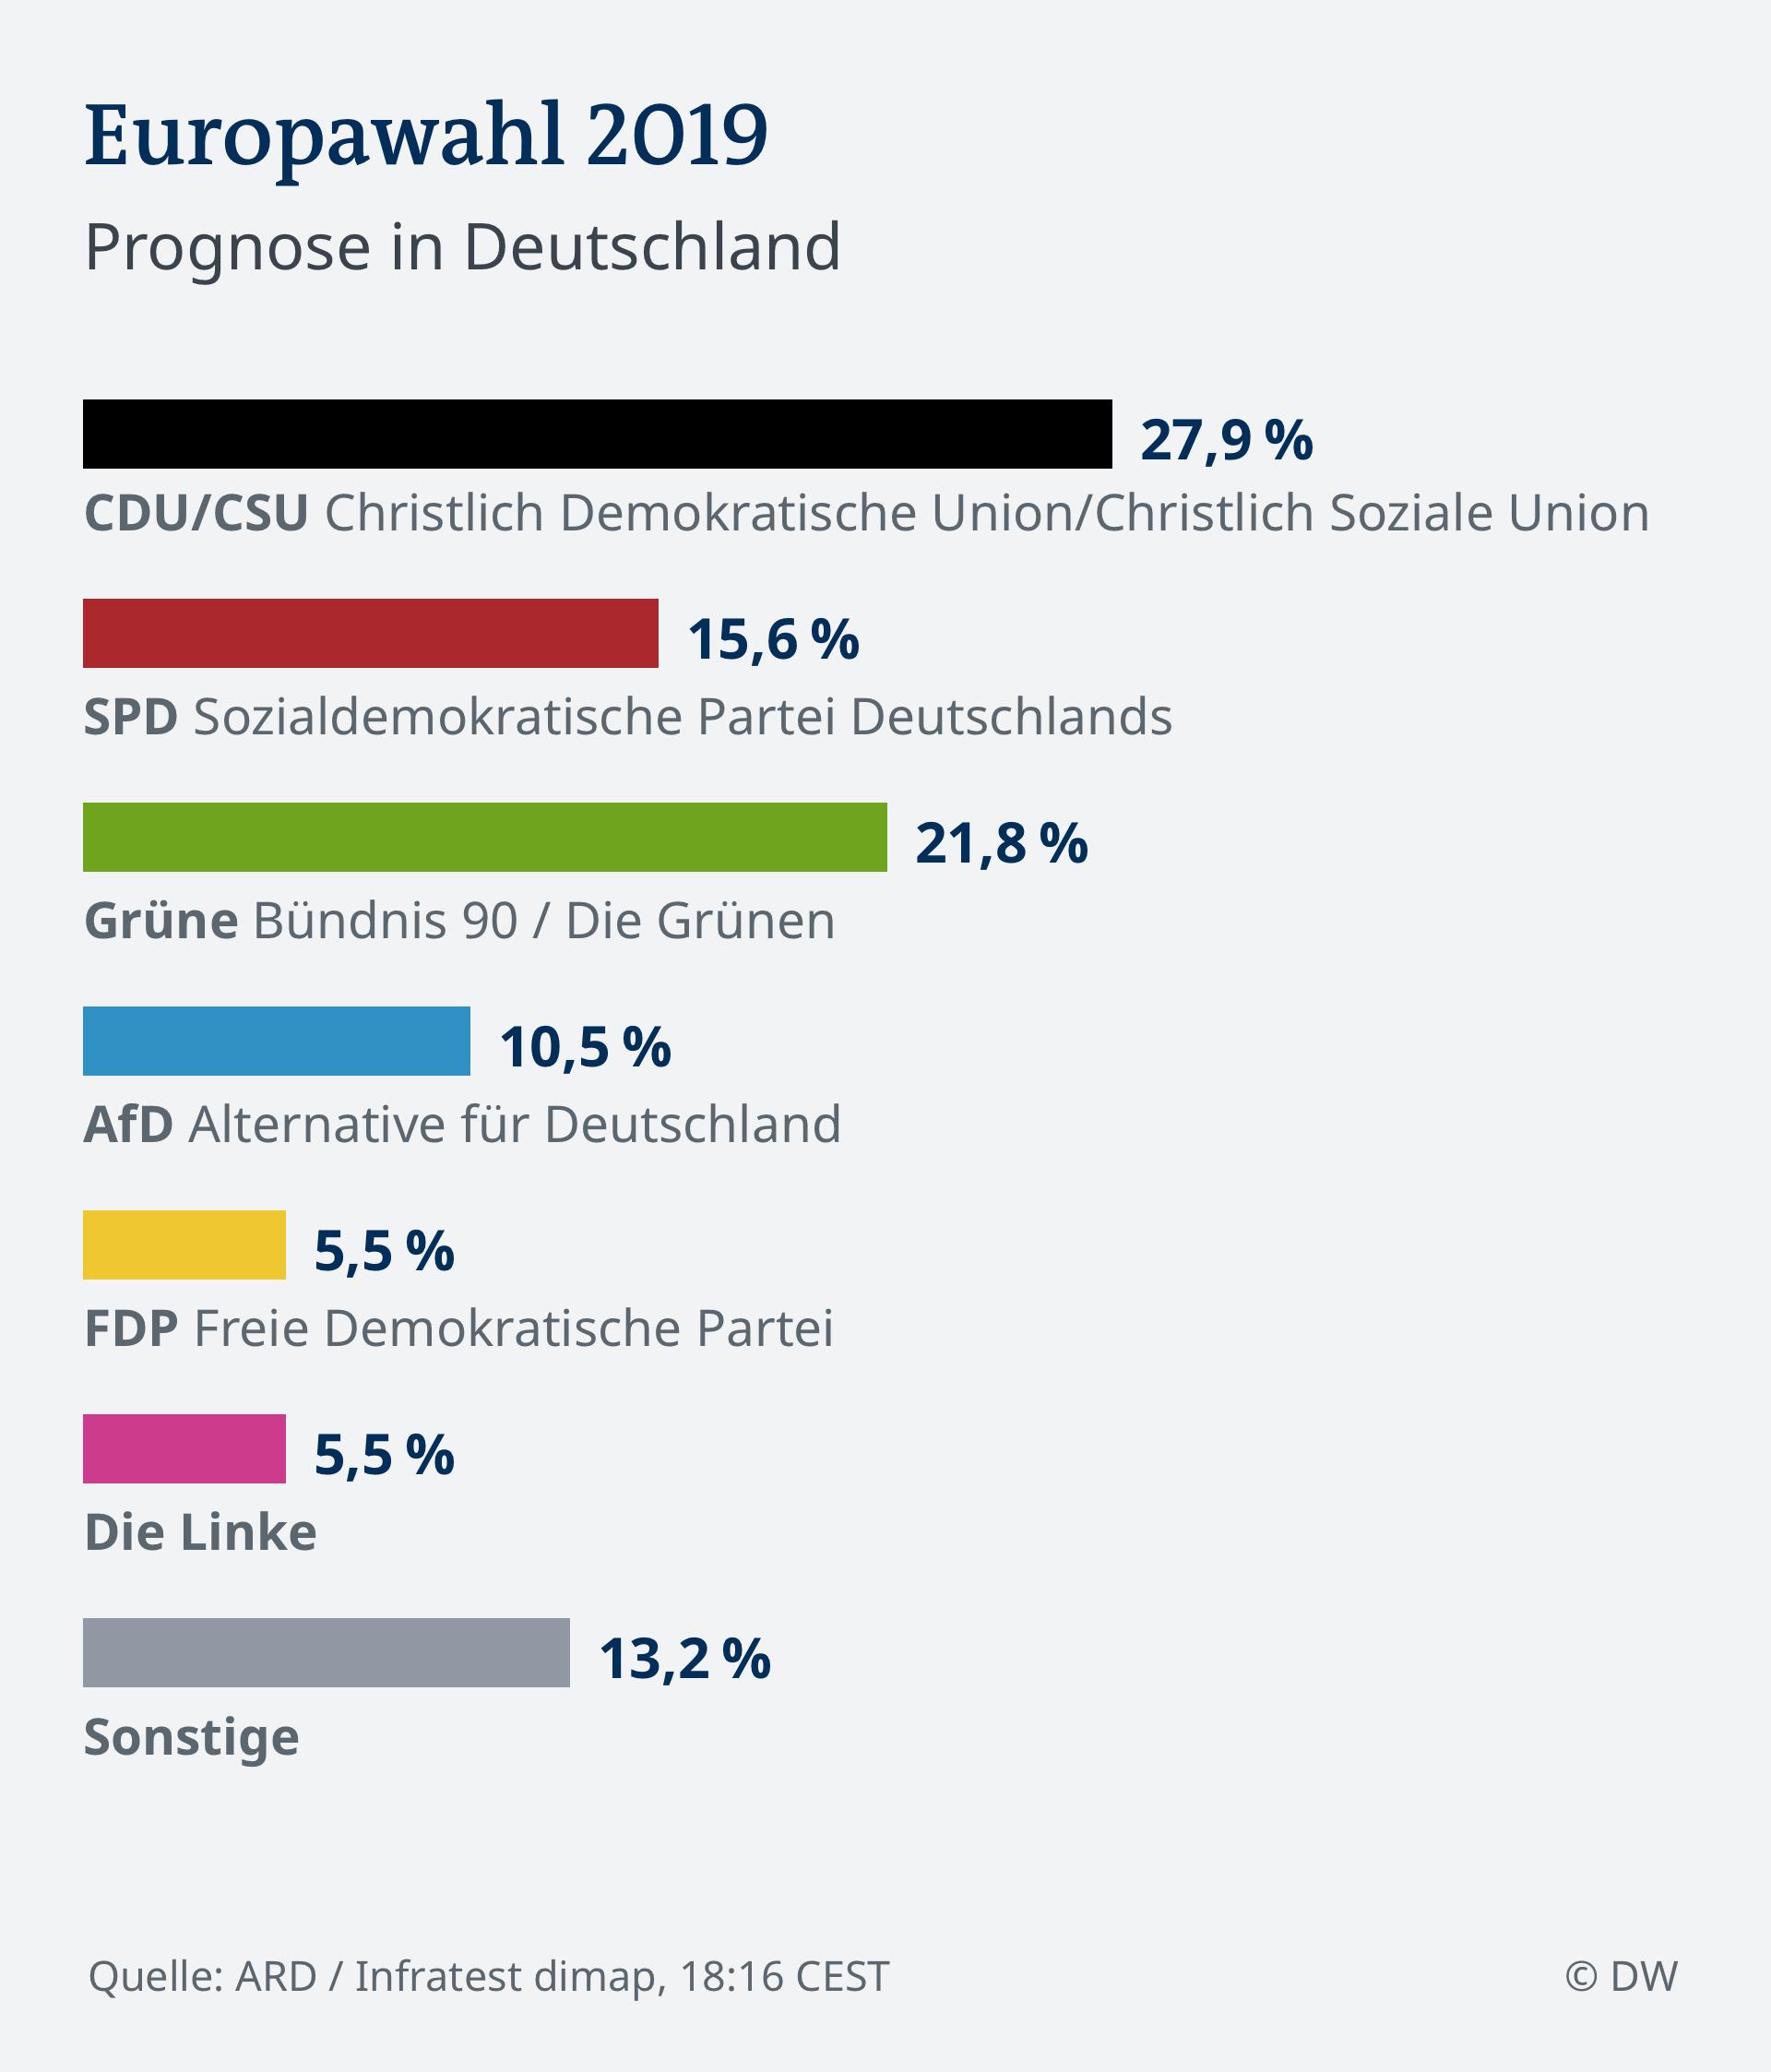 Infografik HOCHRECHNUNG 18.16 EU Wahl 2019 - Deutschland DEU